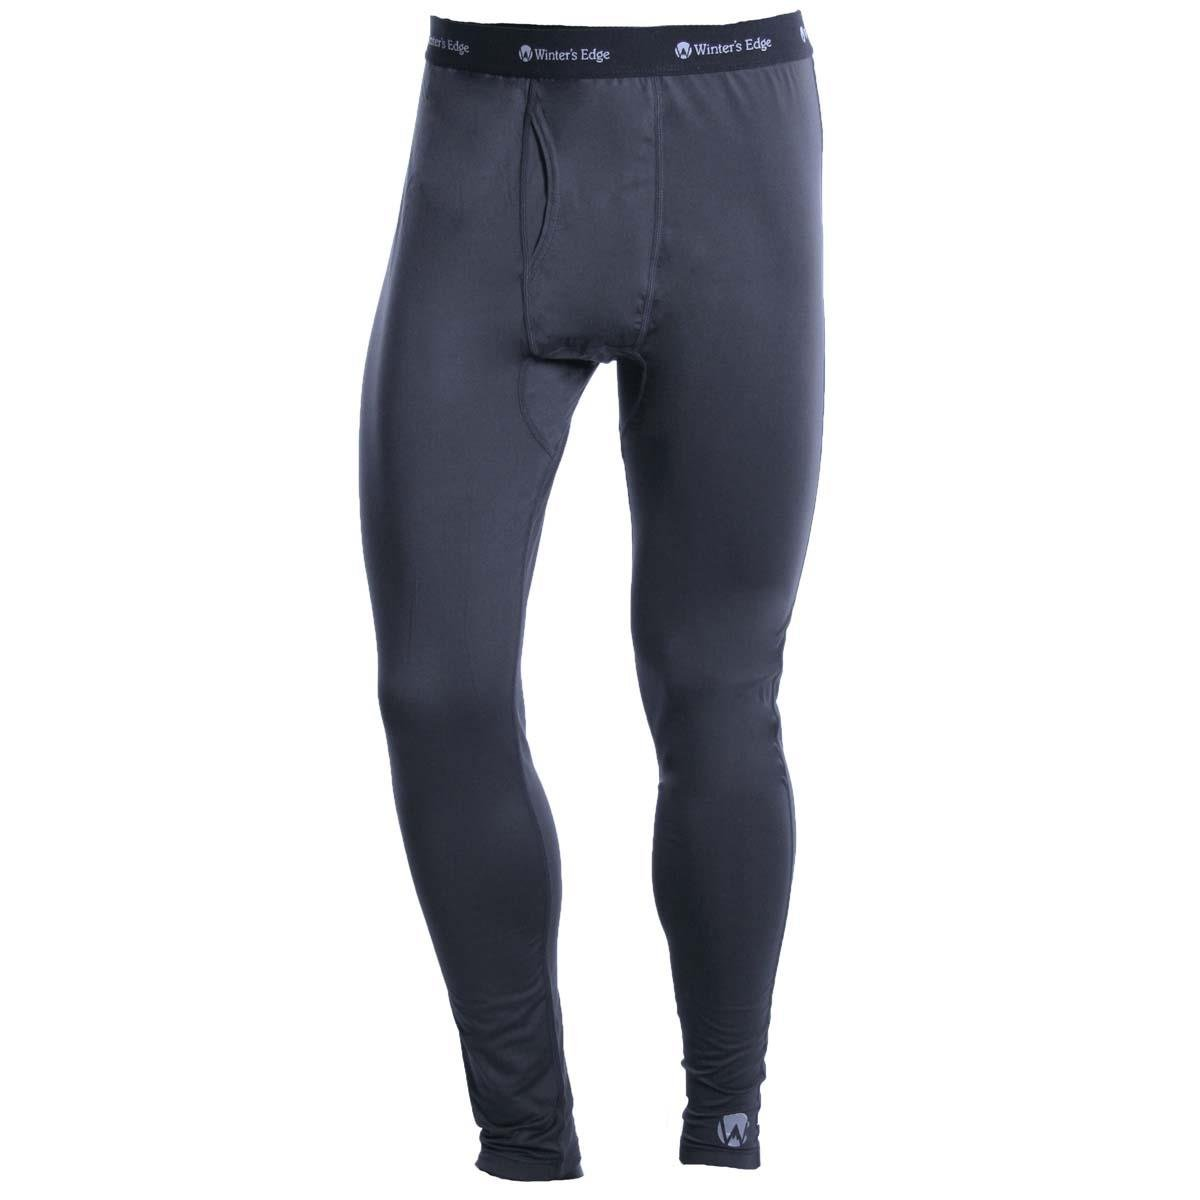 Winters Edge Mens Thermal Long Underwear Bottom